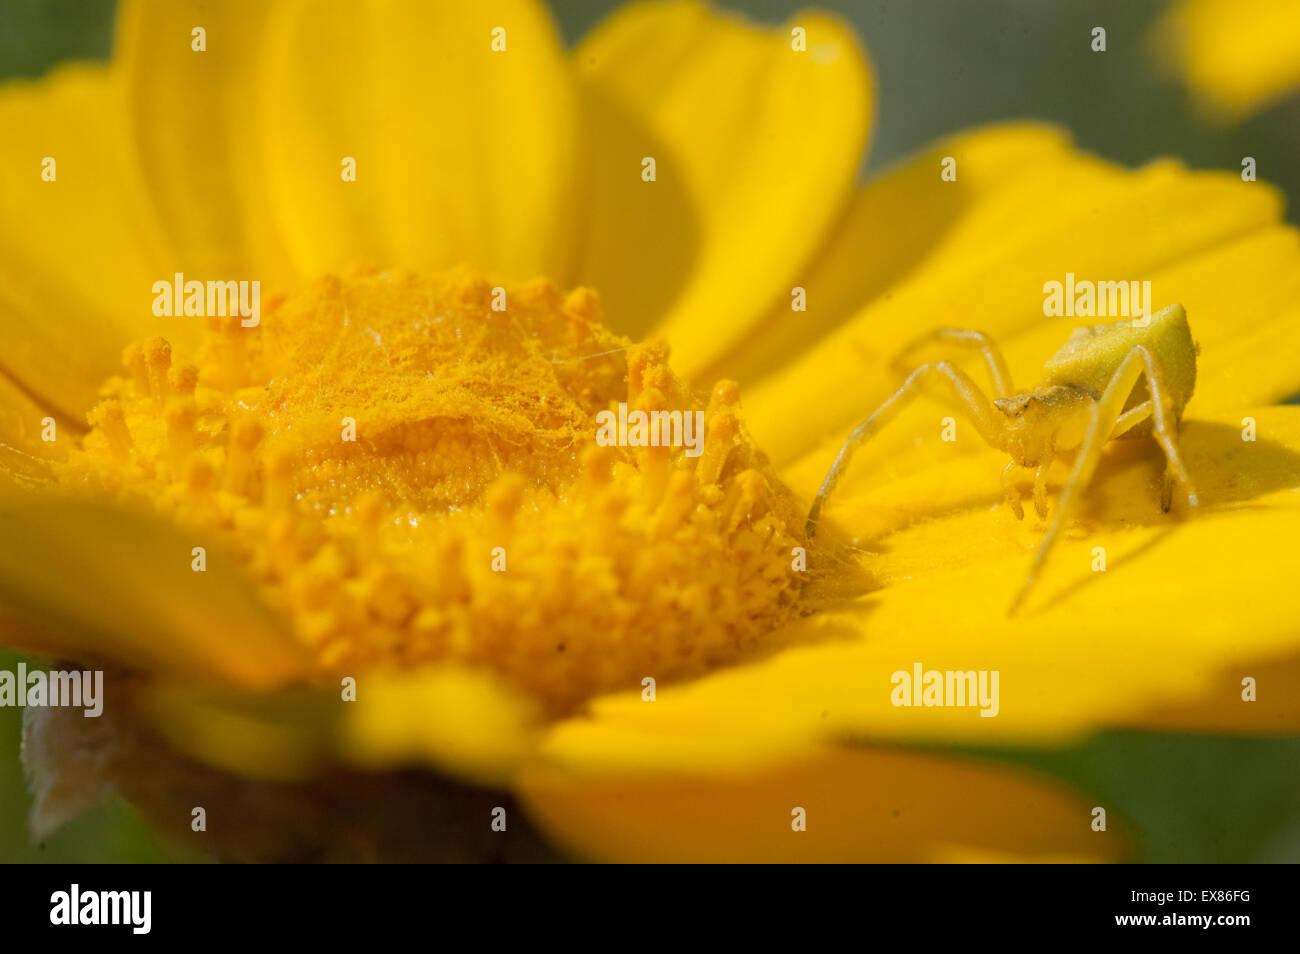 Yellow crab spider (sp) Thomisus onustus, invertebrate lurking in ambush on a yellow daisy. Lemnos/ Limnos island, - Stock Image